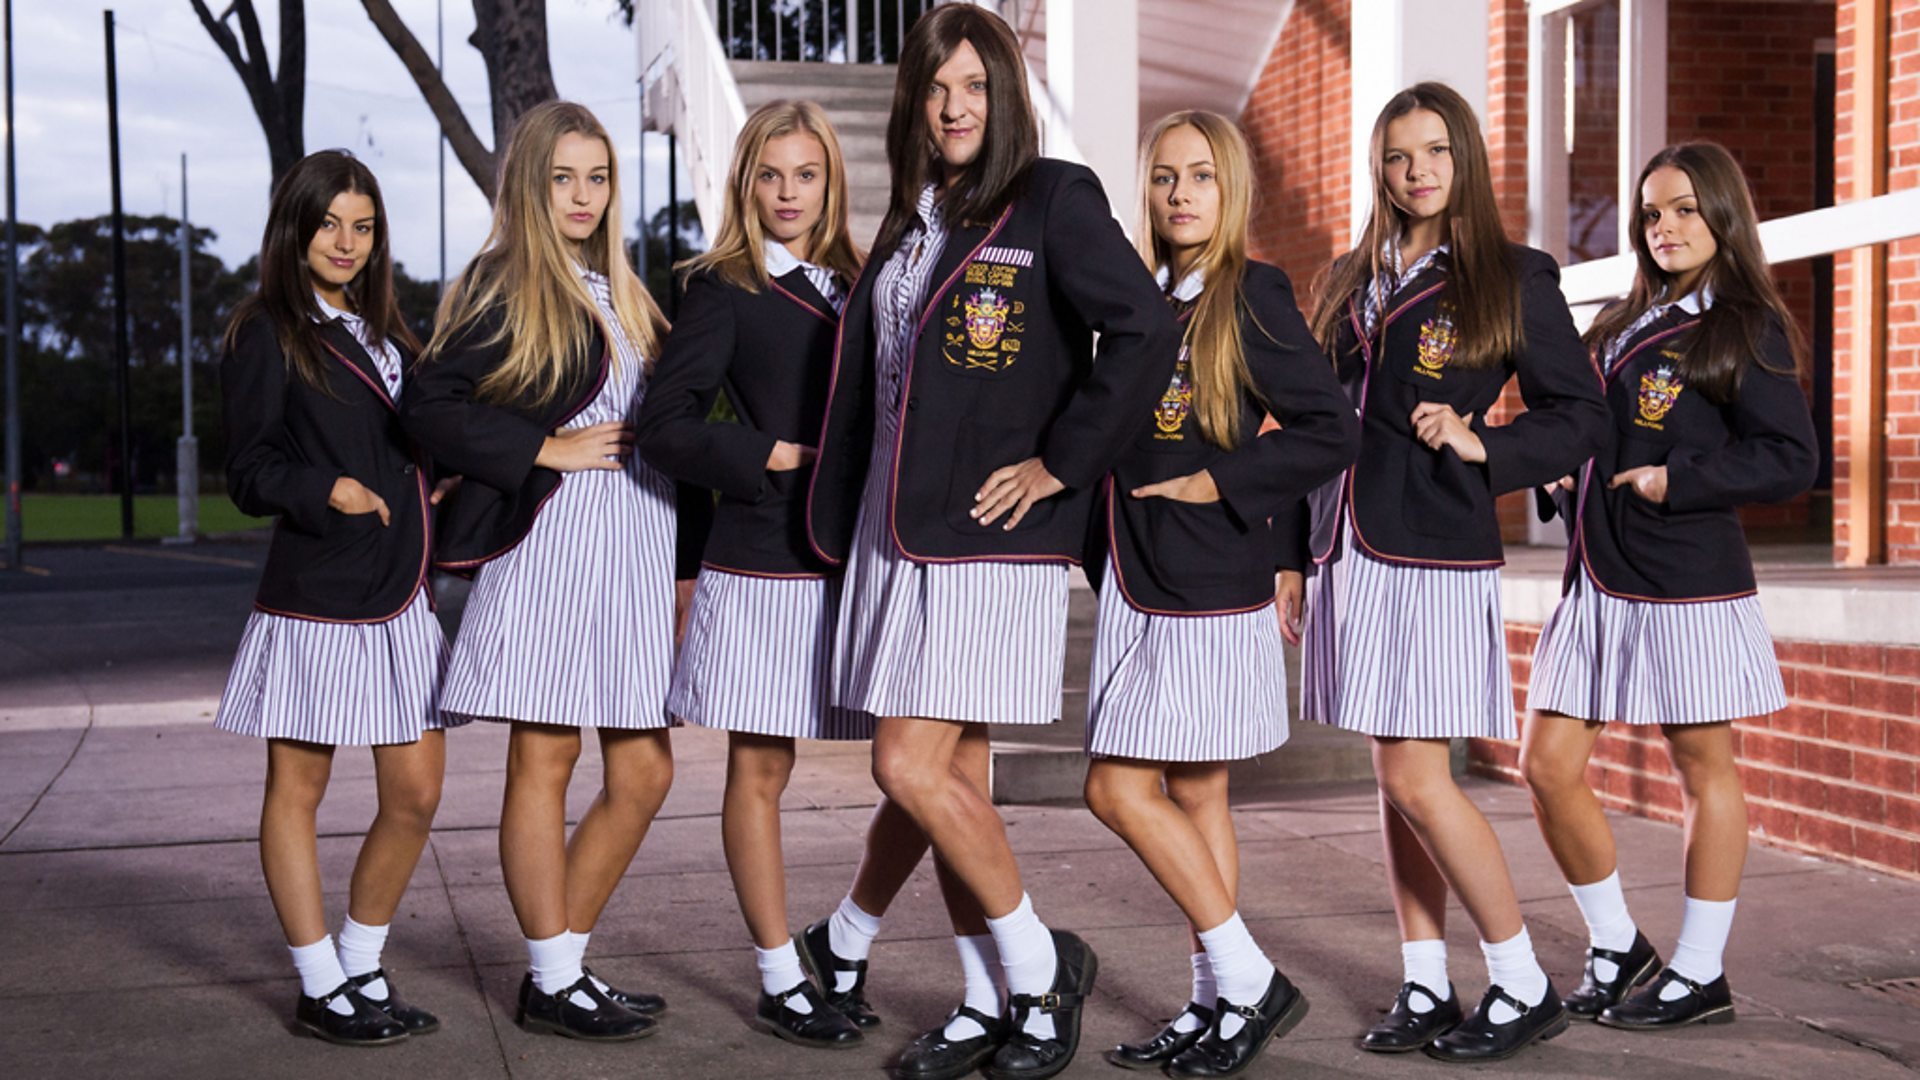 Ja'mie private school girl episode 4 stream online